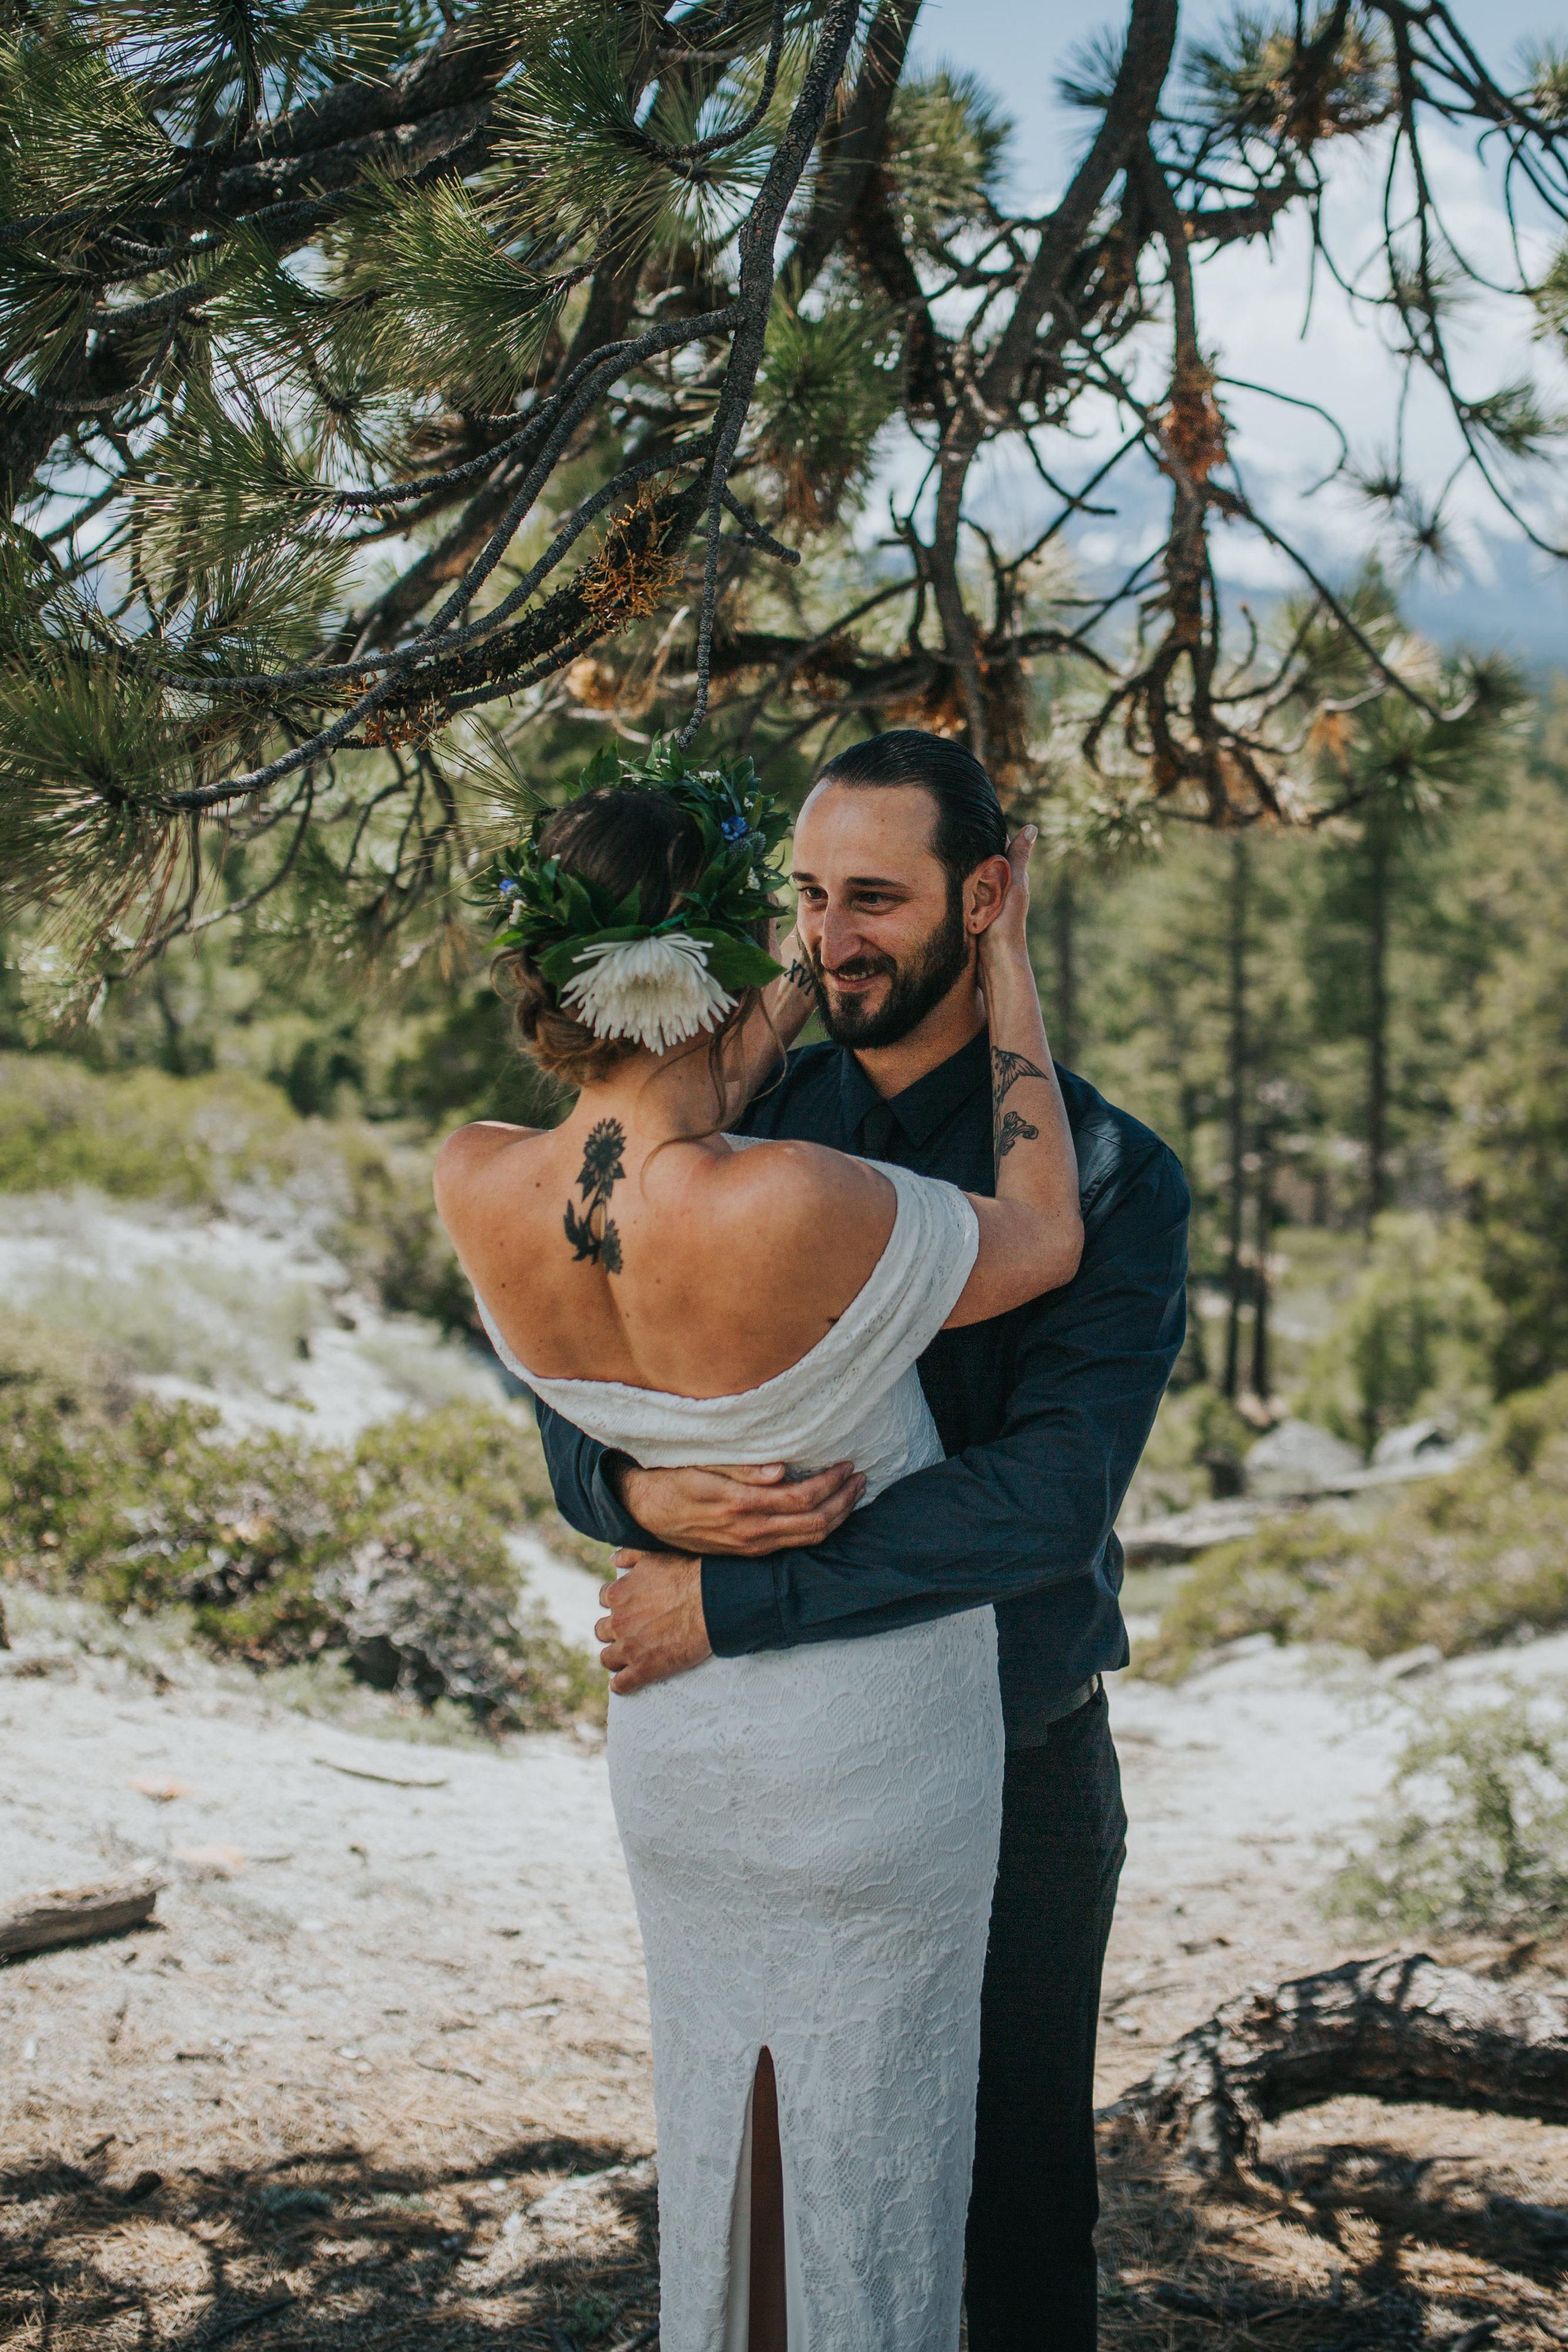 south-lake-tahoe-elopement-valerie-lendvay-photo-015.jpg